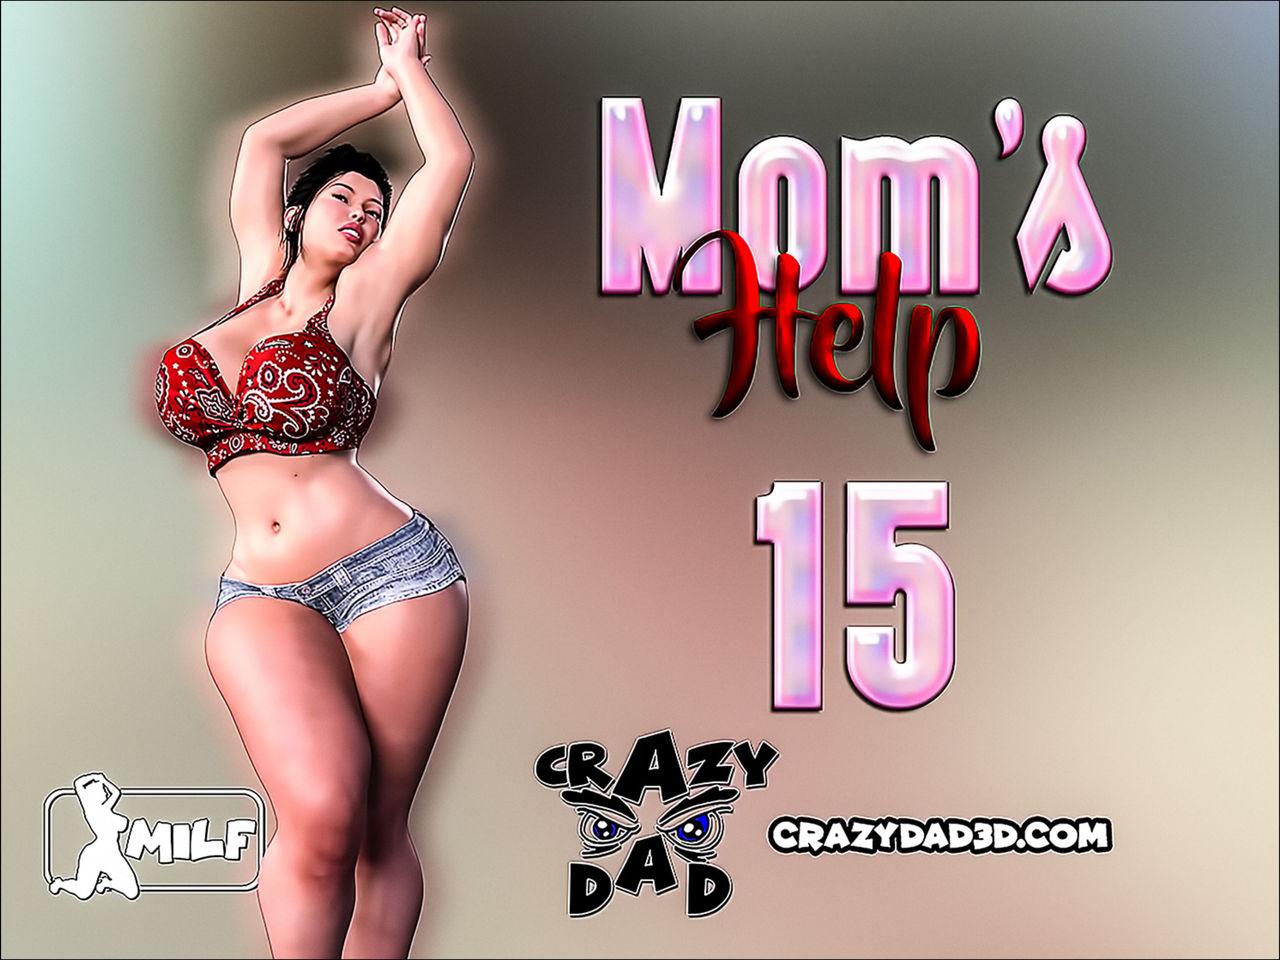 MOMS HELP parte 15